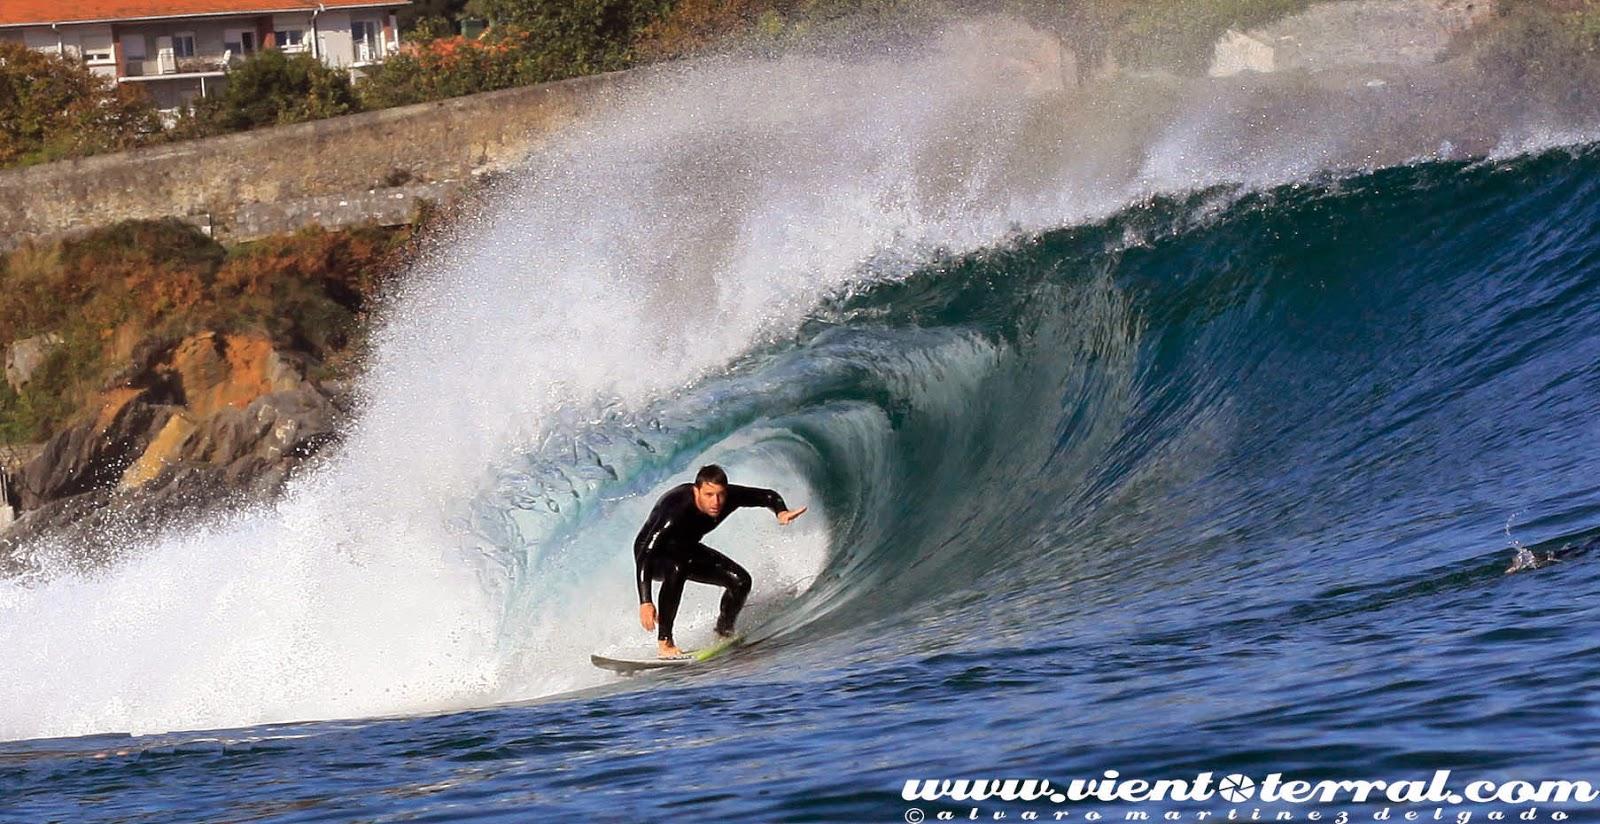 sesion mundaka octubre viento terral surf %2B(2)